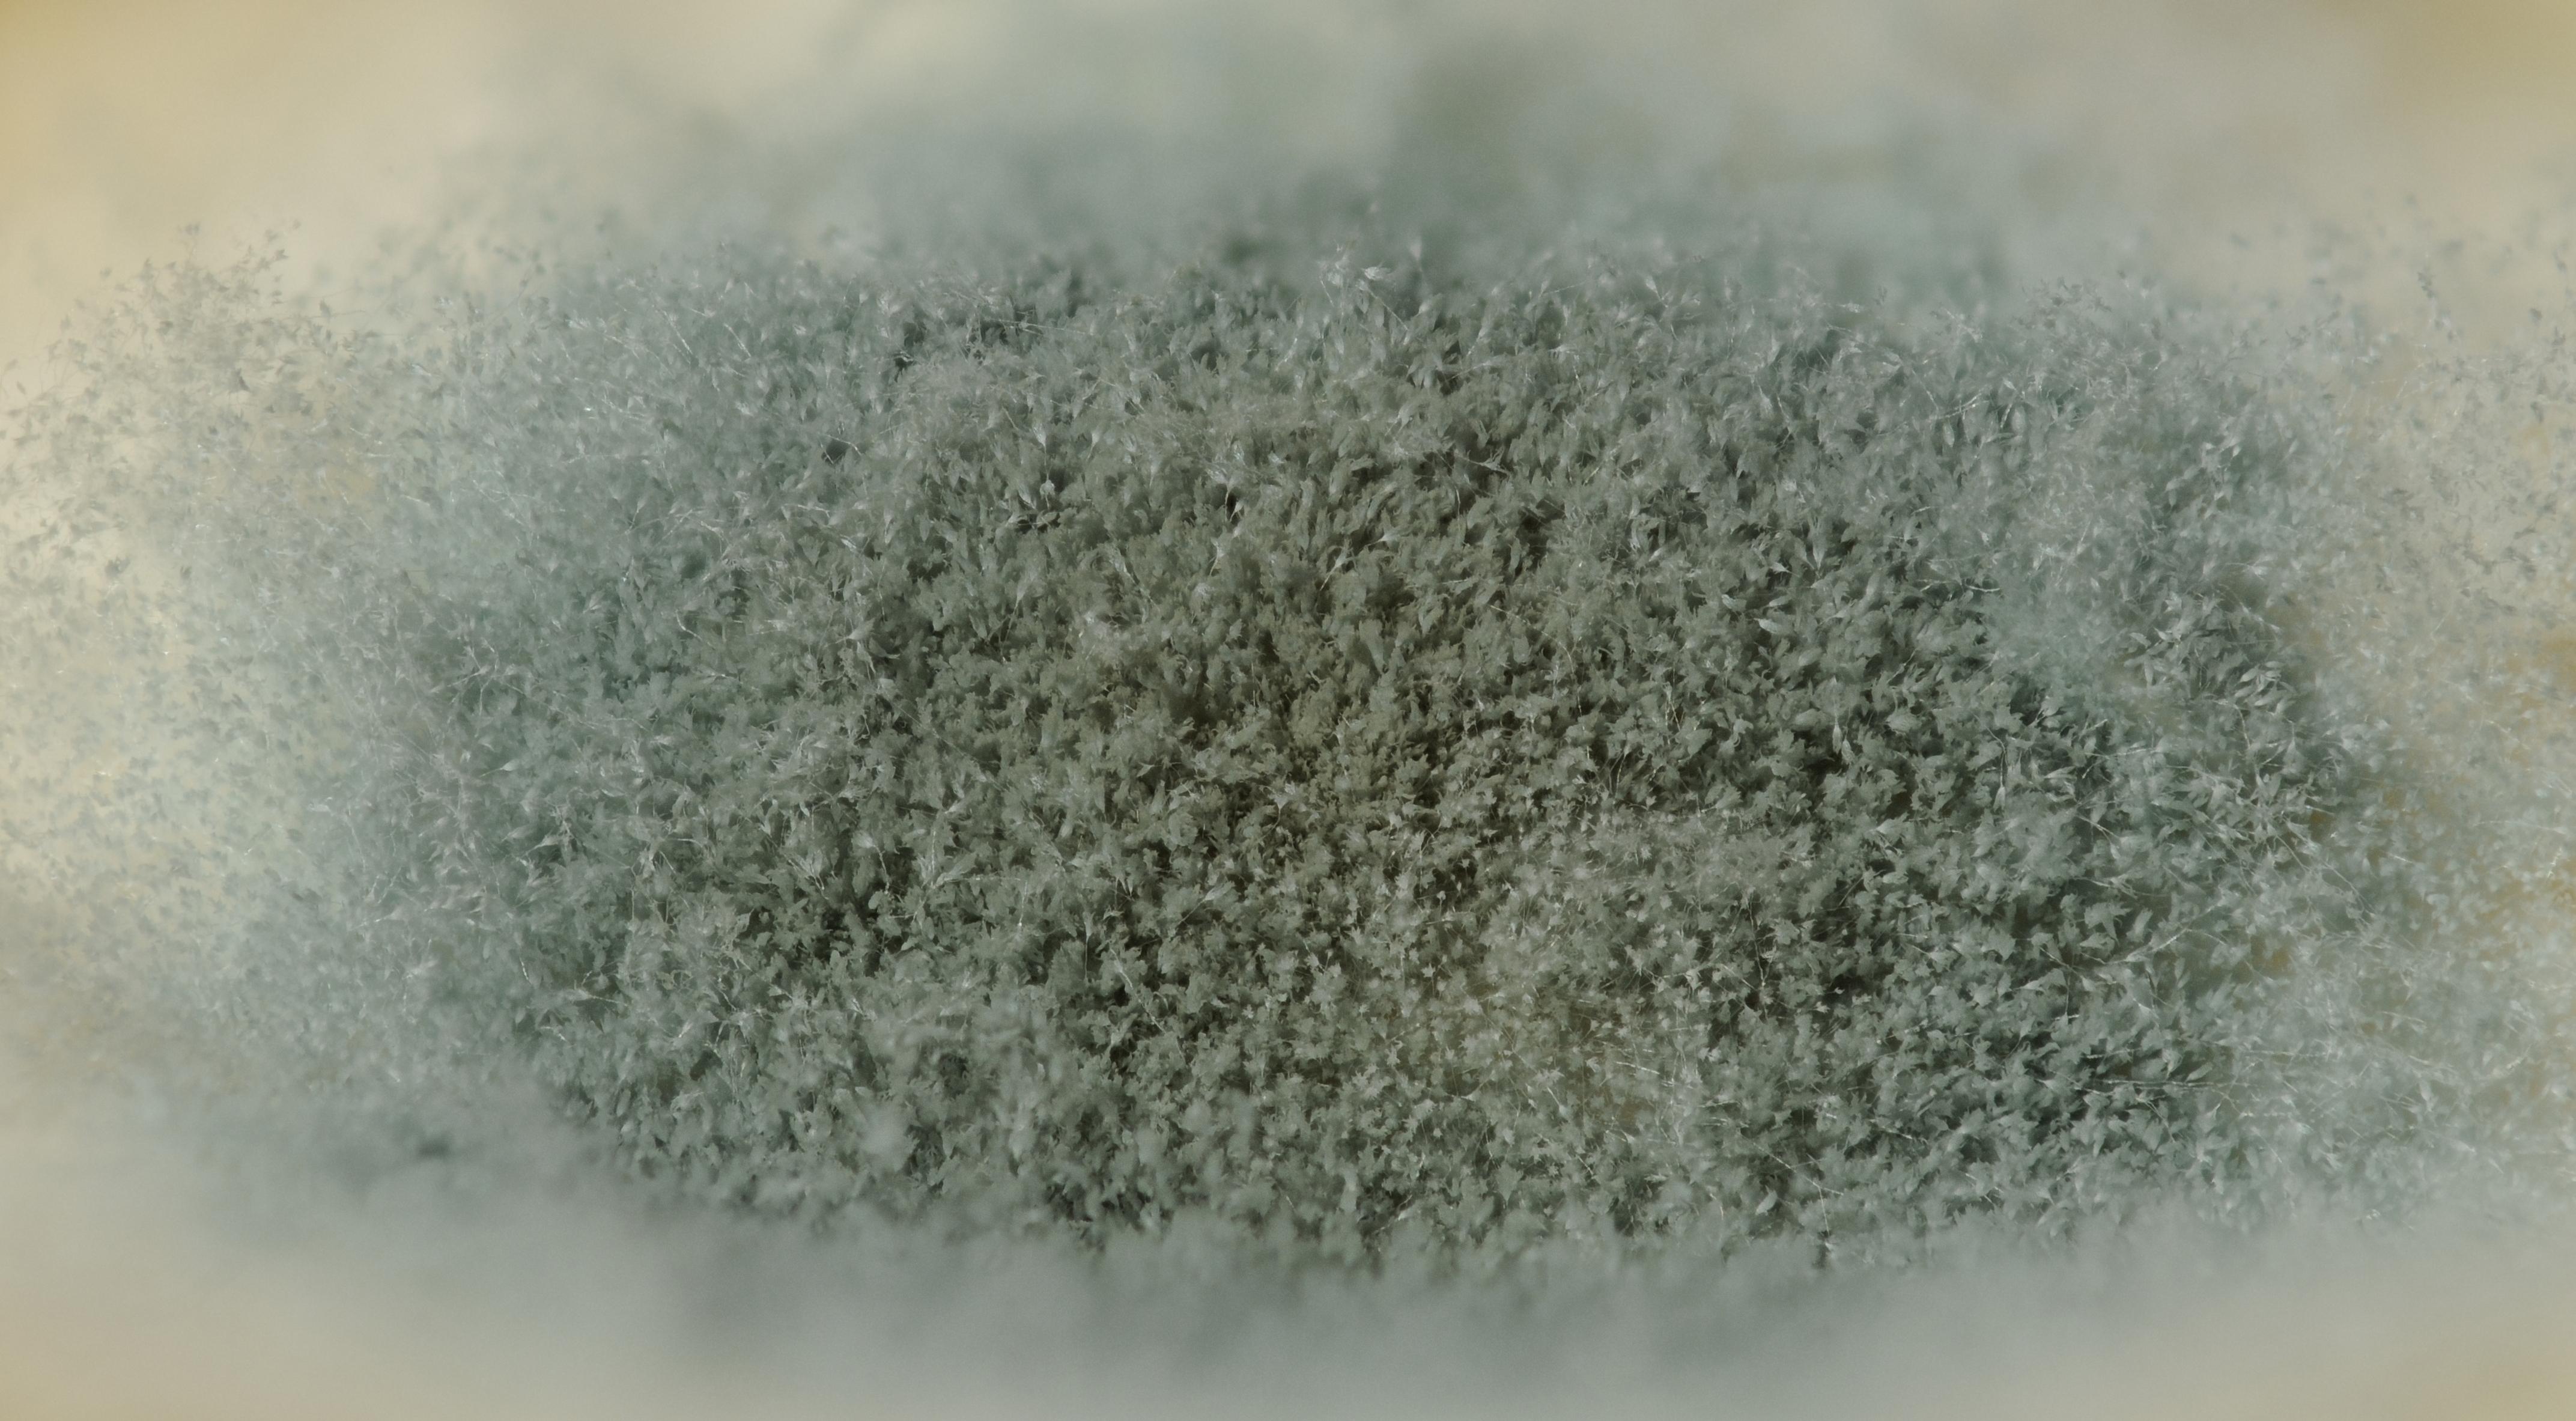 File:2013-01-02 17-41-09-mold-72f.jpg